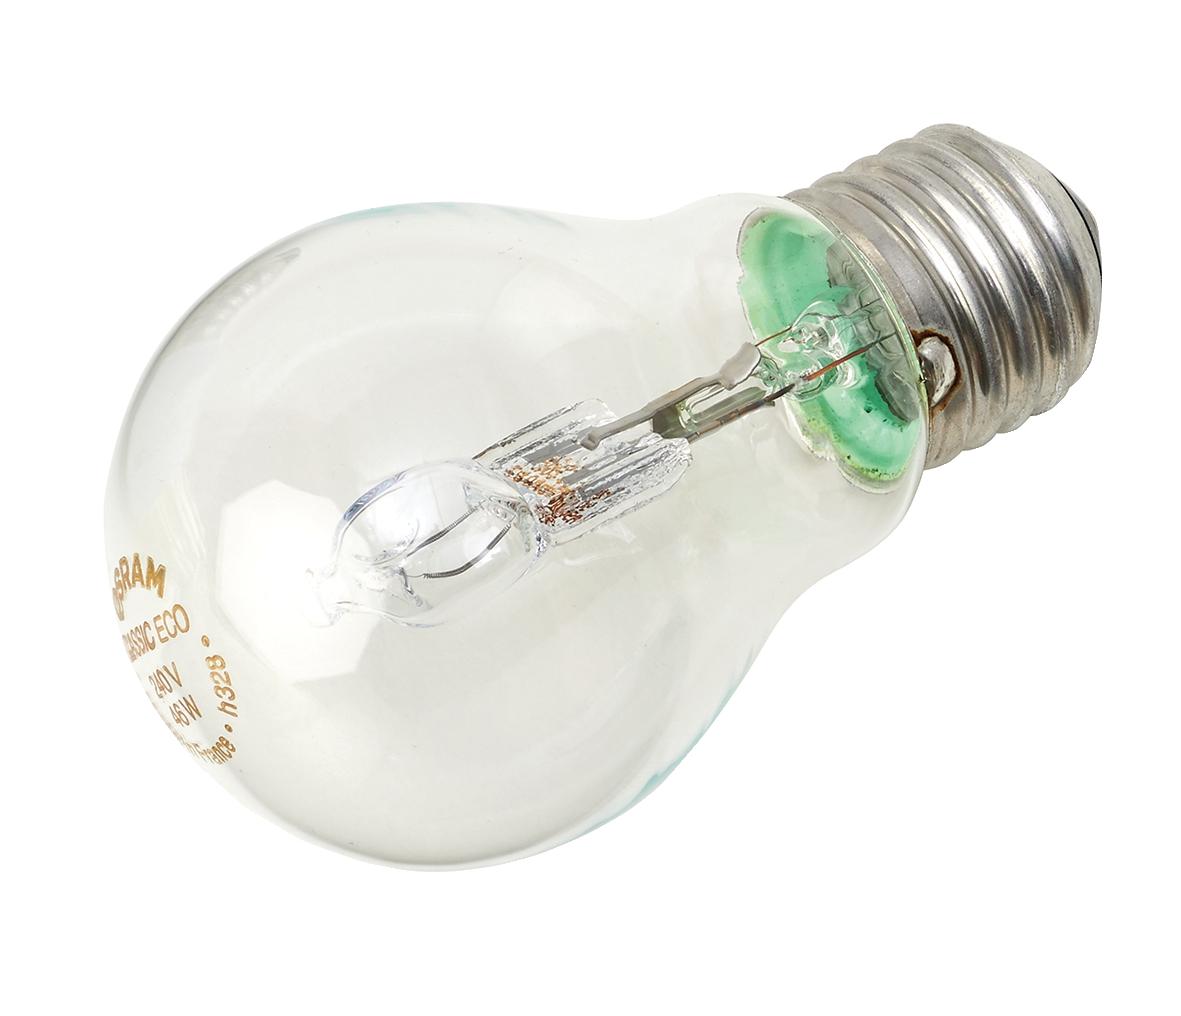 GE Light Bulb Energy Saving GLS Halogen Screw Fitting 42W Clear Ref 79422